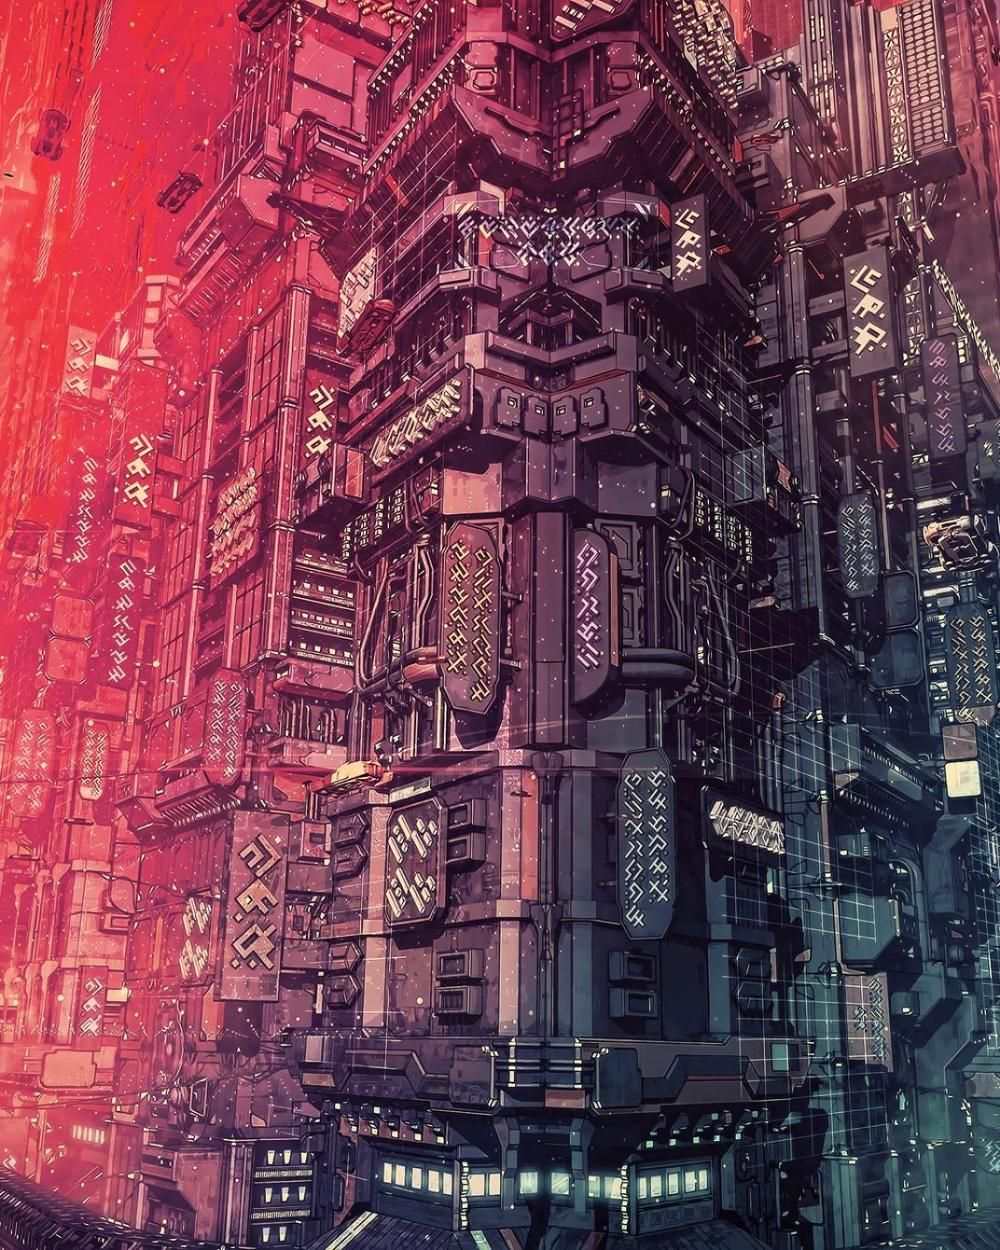 Cyber Futuristic City Fantasy Art 4k Pixel 3 Hq Wallpaper Cyberpunk City Cityscape Citylights Art A In 2020 Futuristic City Cyberpunk City Steampunk Wallpaper